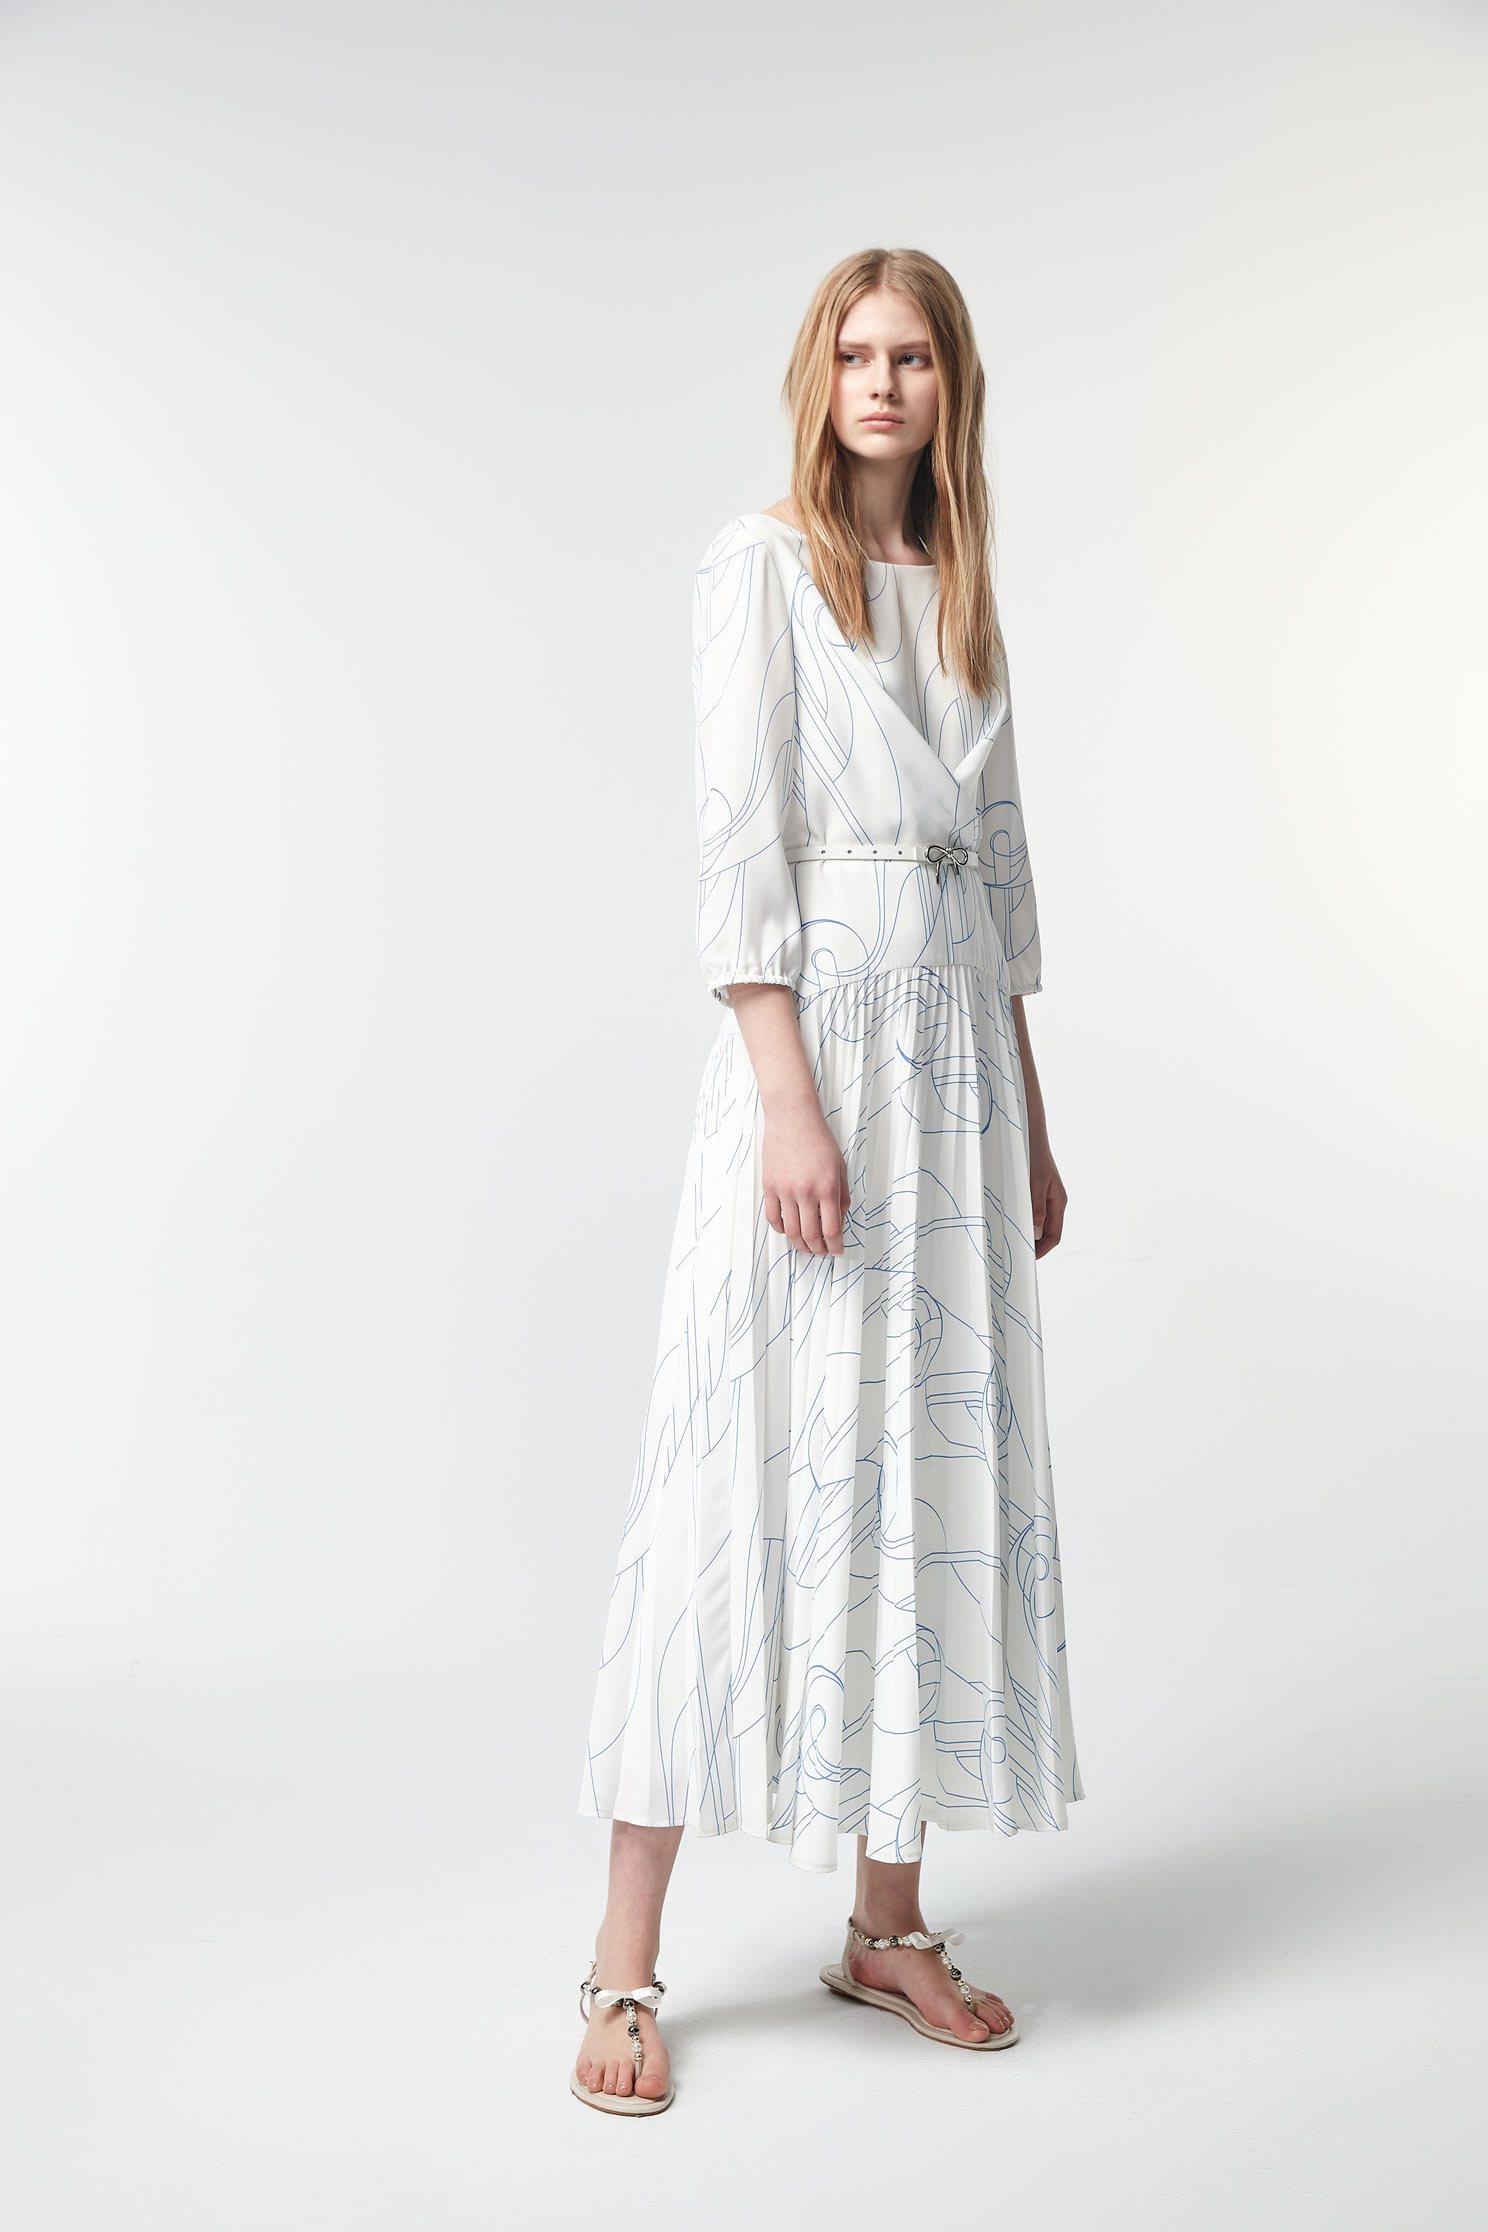 Hand-painted line print dress,U-neck dresses,Dresses,Printed dresses,Chiffon dresses,Season (SS) Look,Floral dresses,Season (AW) Look,Valentine,dresses,Maxi dresses,Long sleeve dresses,Chiffon,Chiffon dresses